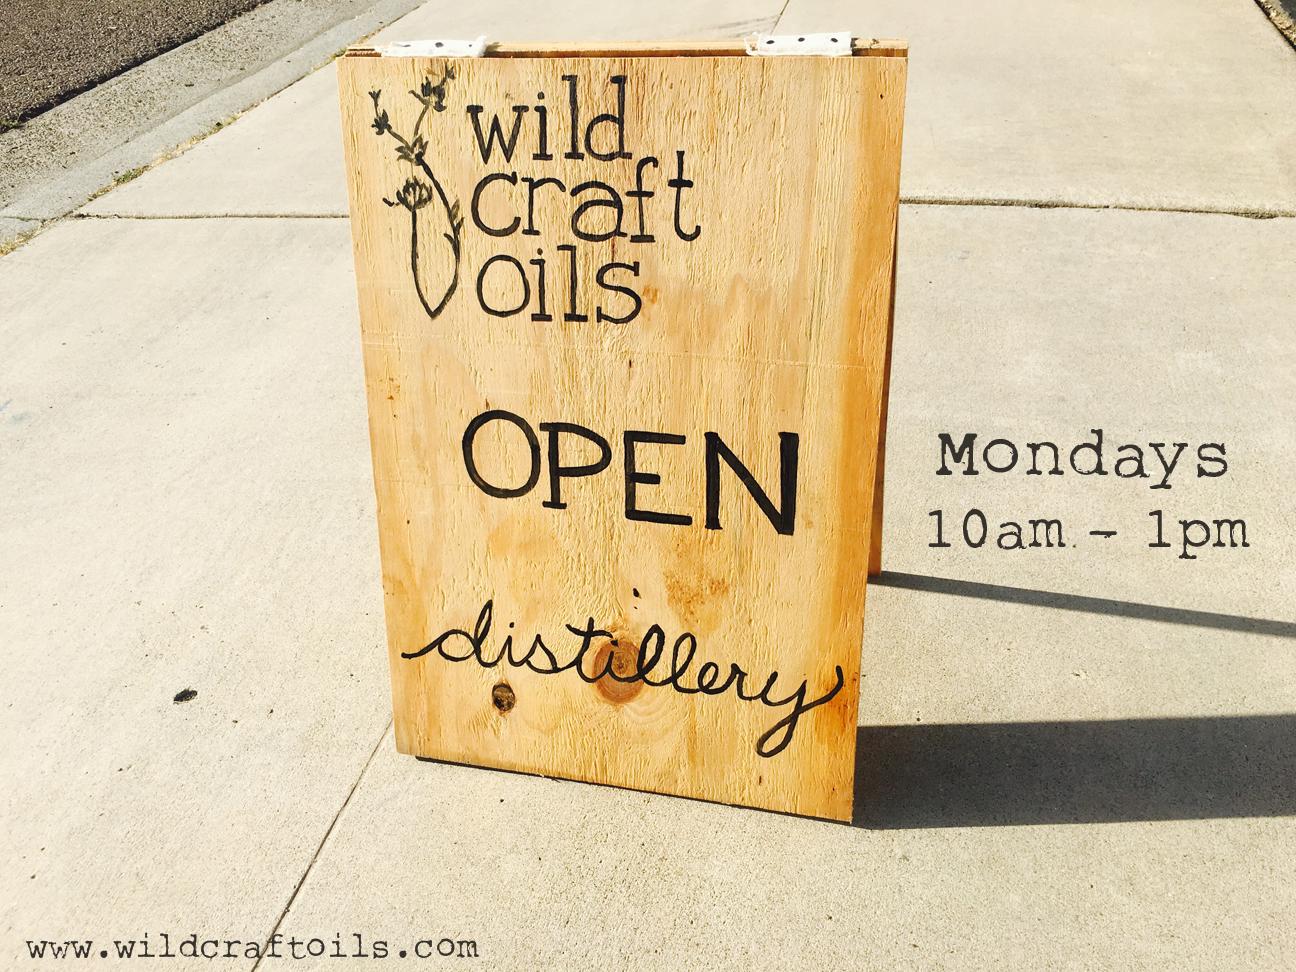 Wild Craft Oils | Micro distilled essential oils and hydrosols | Encinitas, Ca.